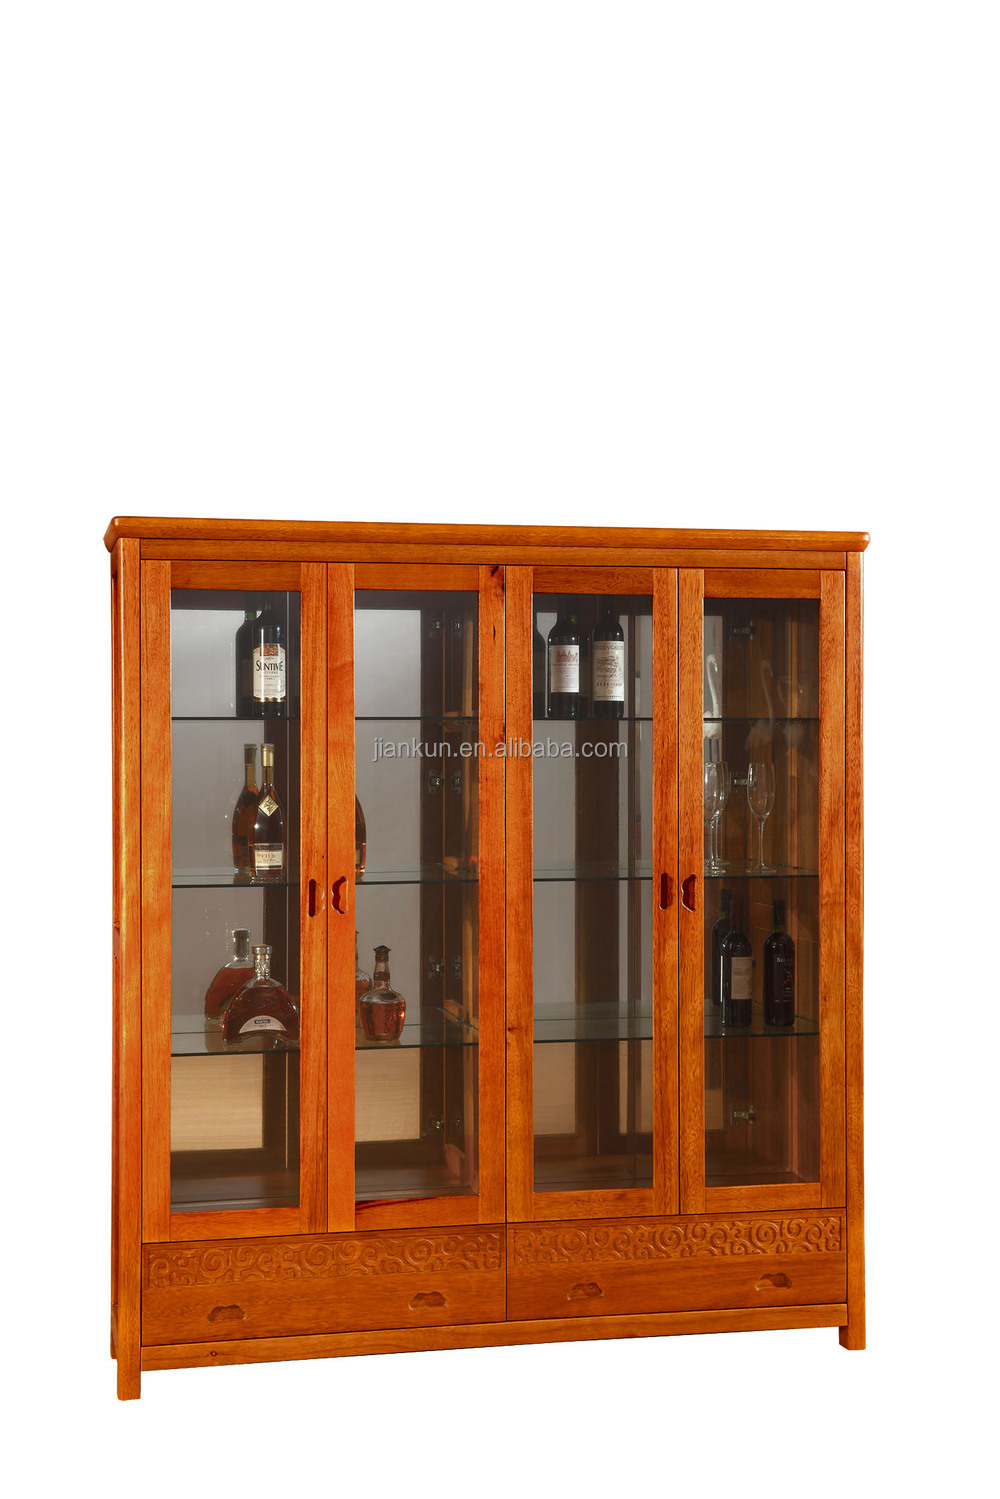 Living Room Furniture Kerala solid wood livingroom furniture kerala wood furniture - buy kerala